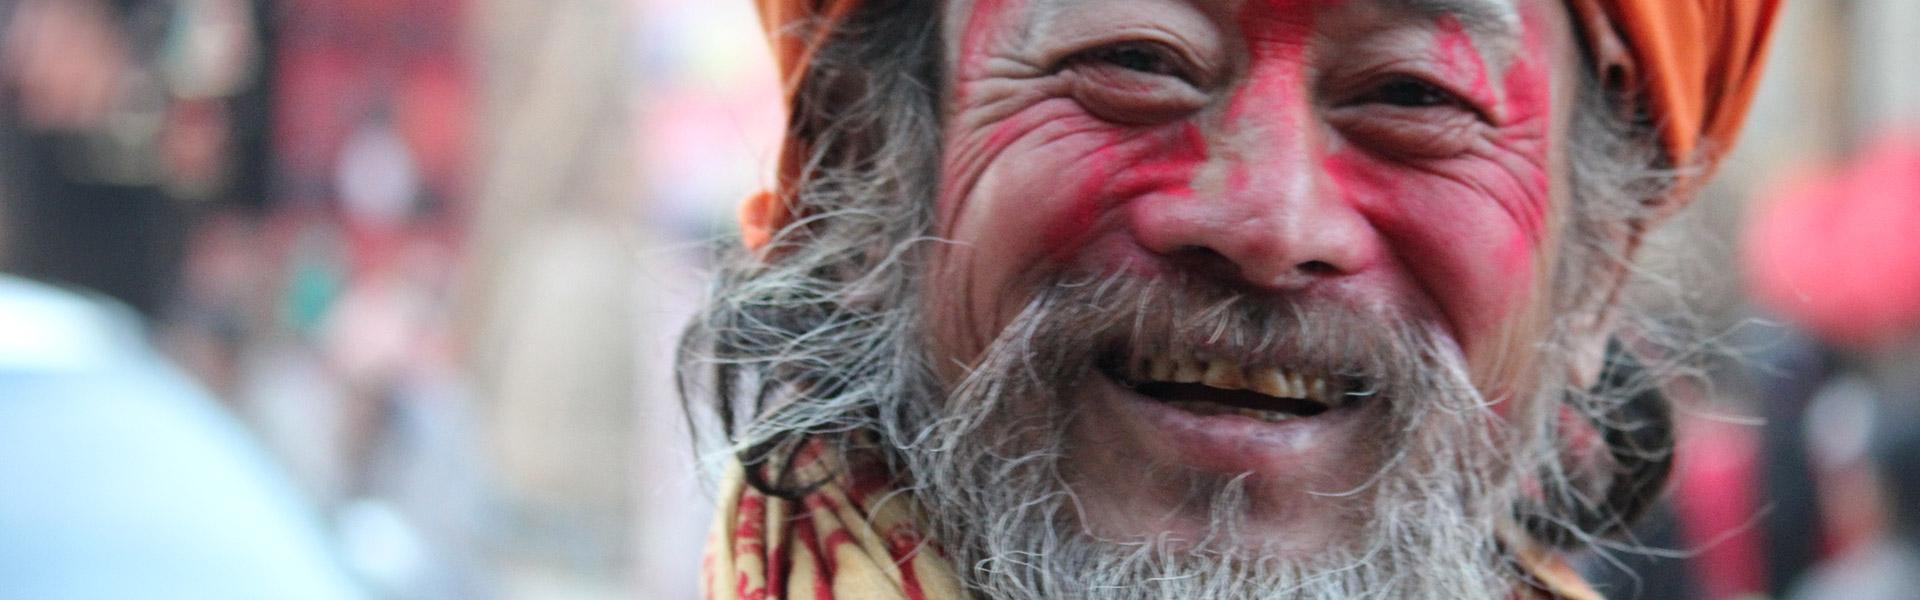 Kathmandu - das Tal Yoga, Ayurveda and Trekking in Himalaya